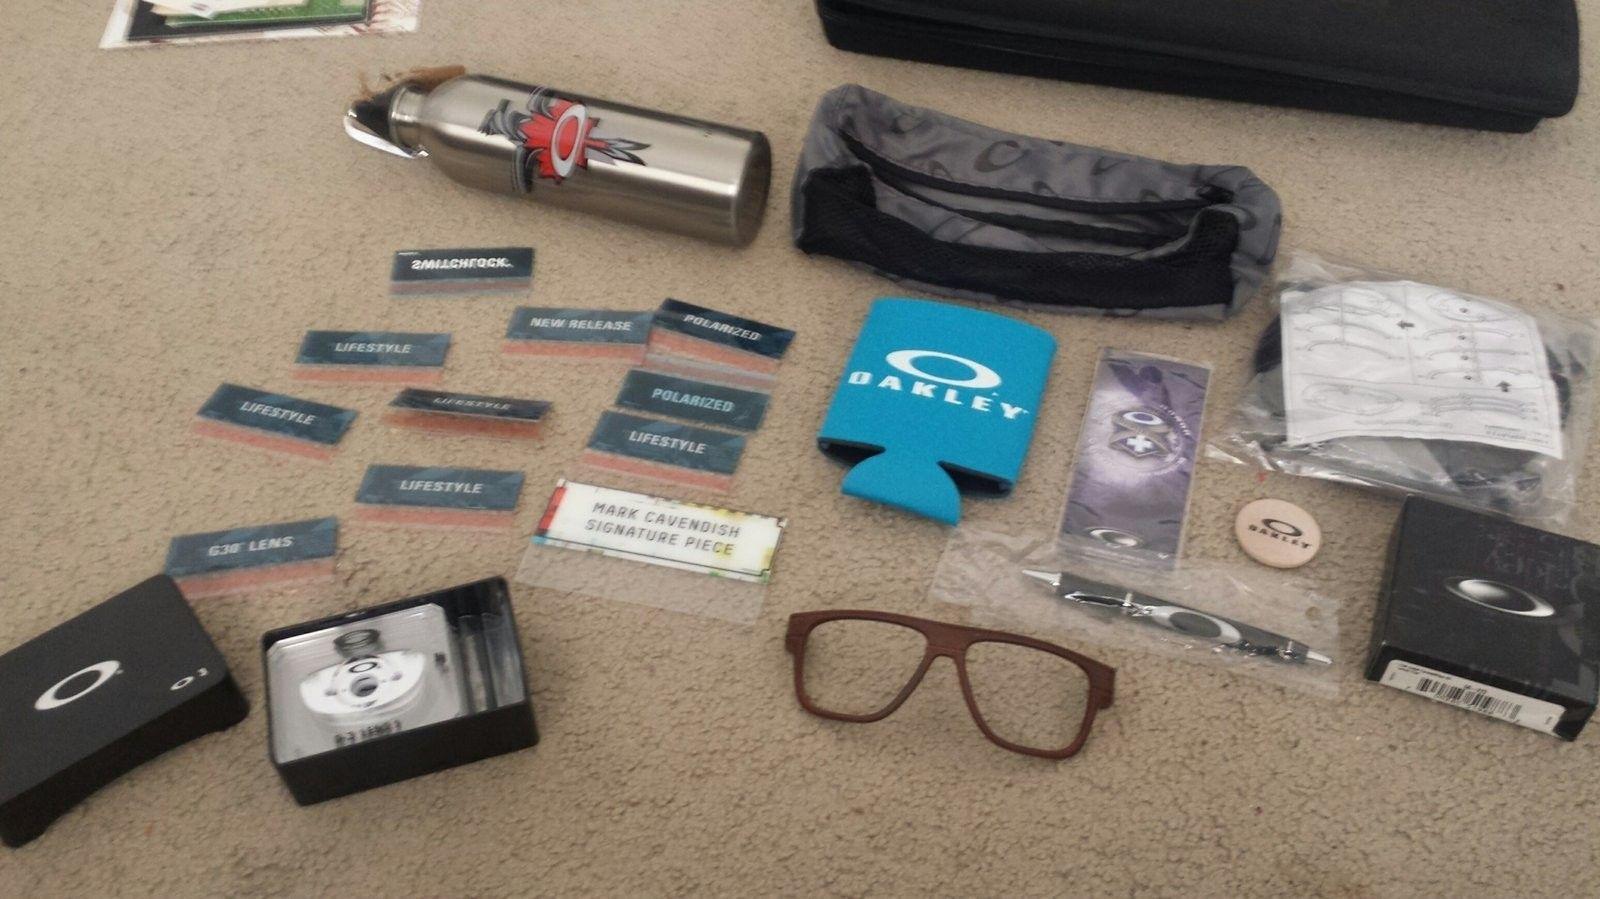 Random Bundle*New Items Added*$140 - 20160405_103054_resized.jpg